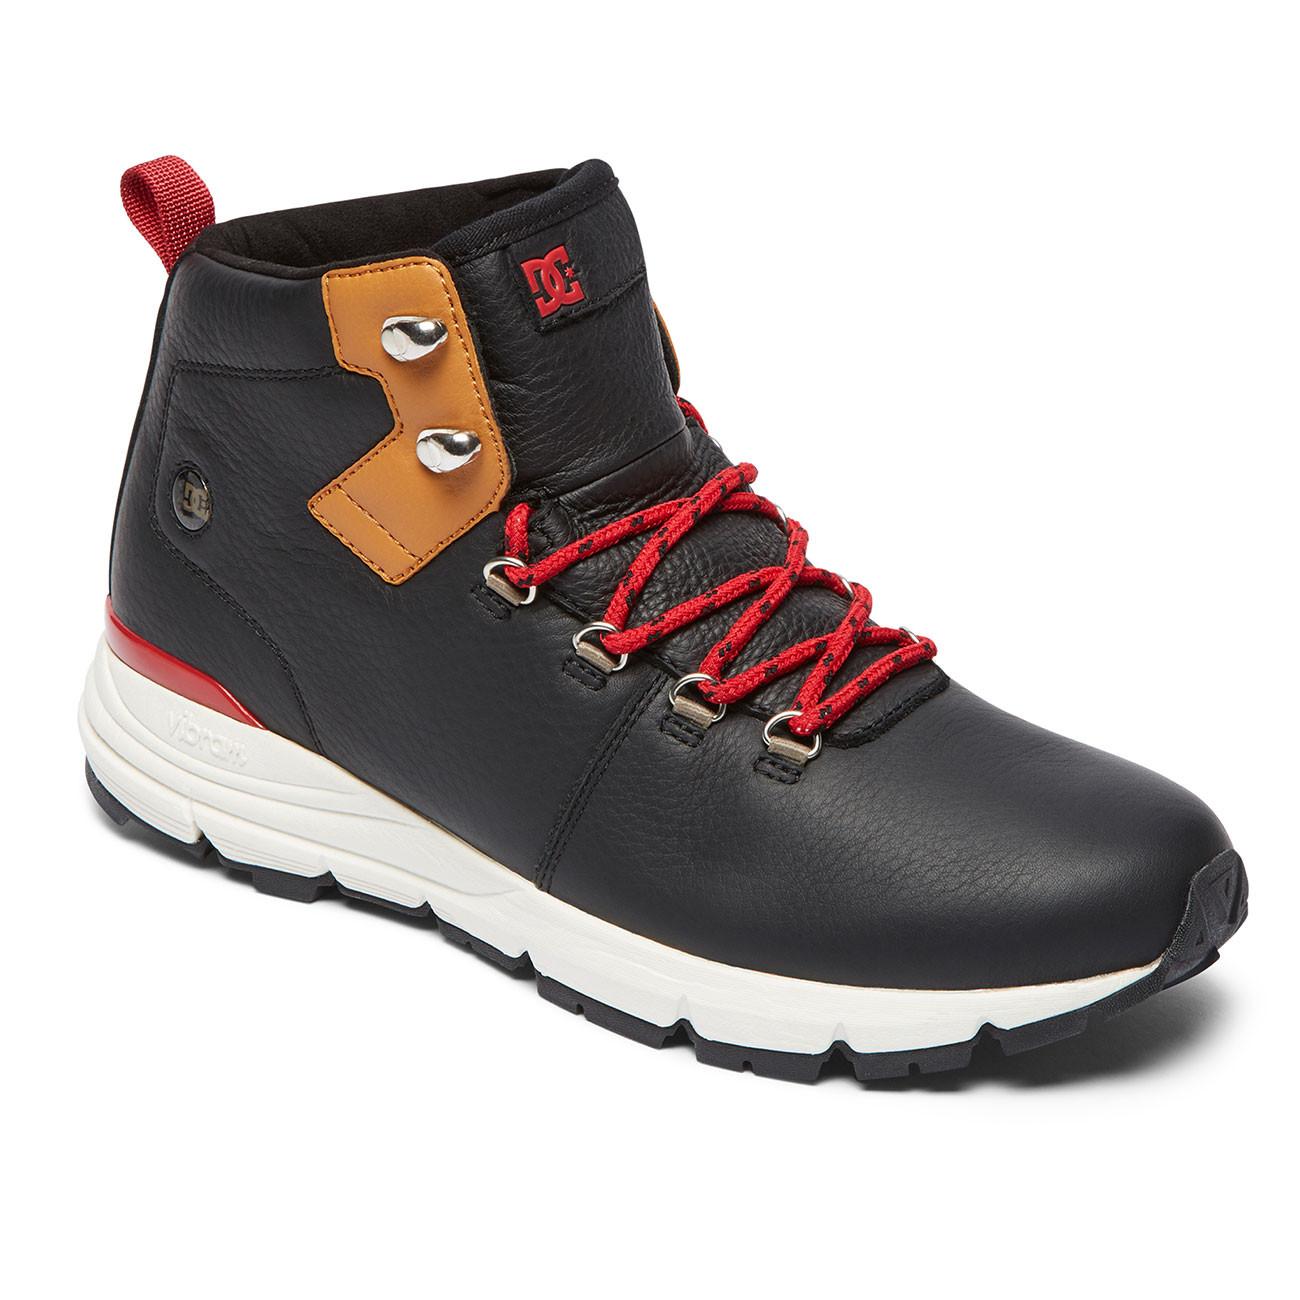 Zimní boty DC Muirland LX black brown black  63681c9b61